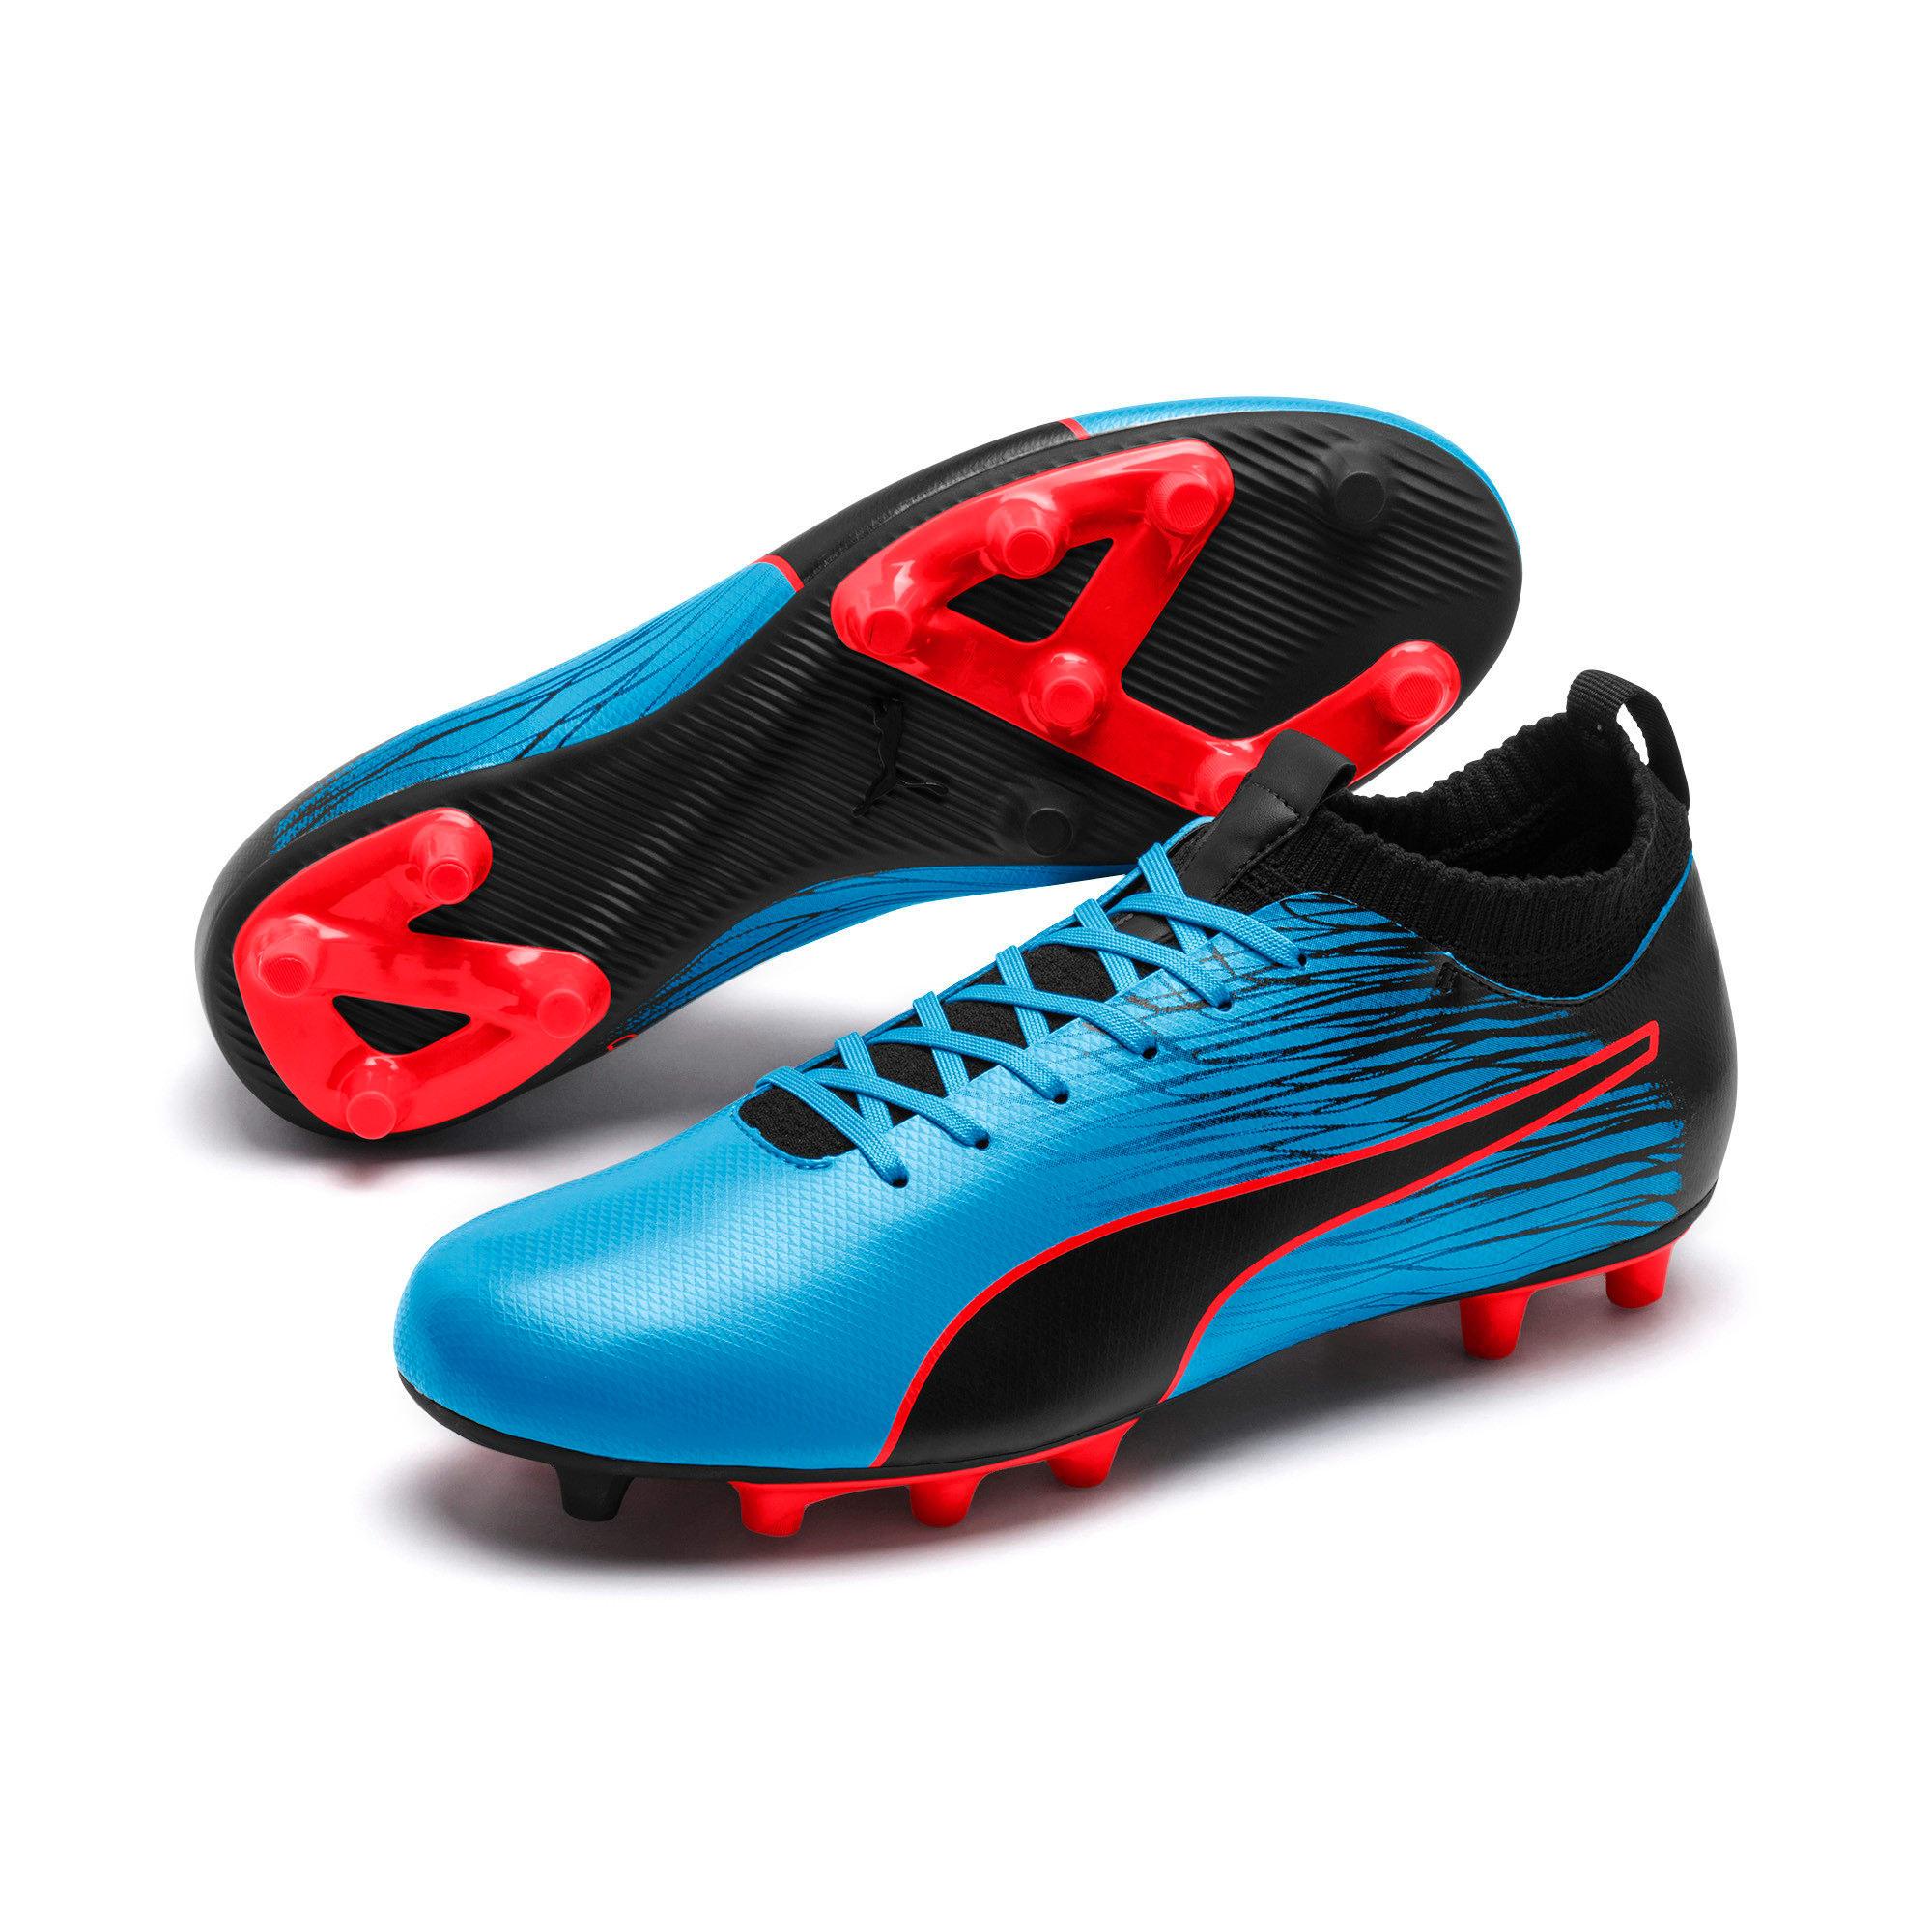 Thumbnail 4 of evoKNIT FTB II FG Men's Football Boots, Bleu Azur-Red Blast-Black, medium-IND